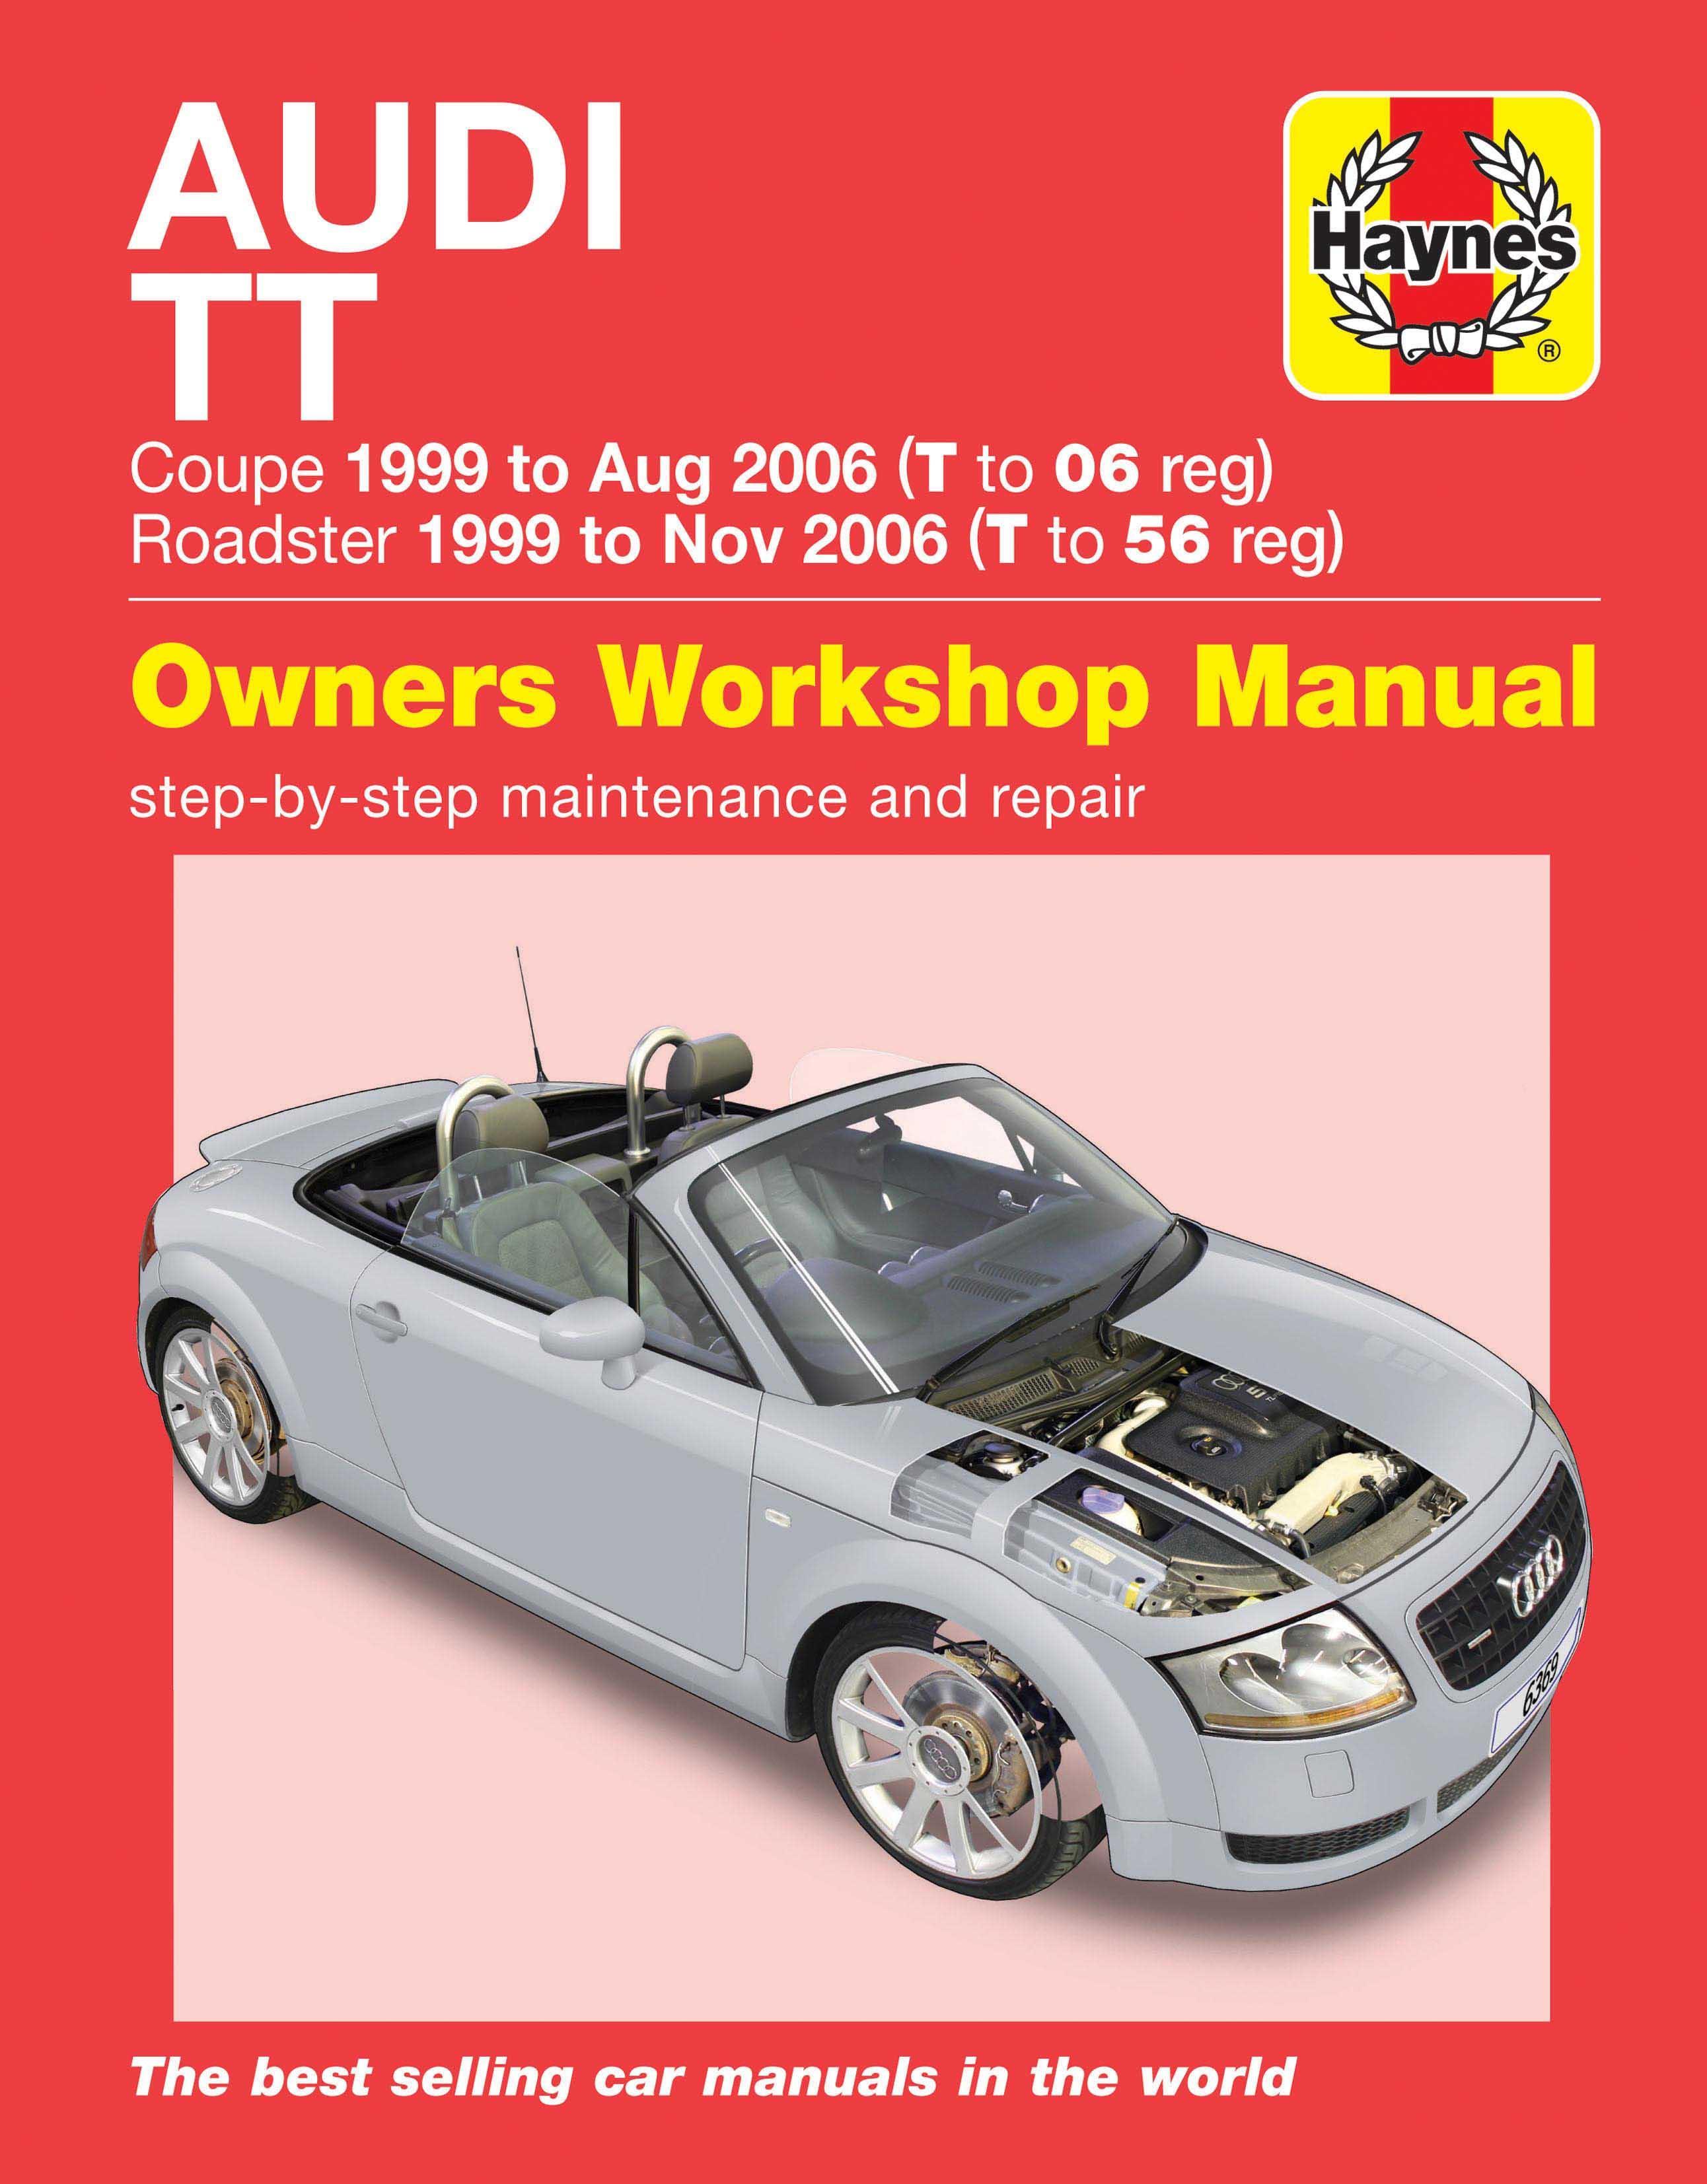 haynes audi tt 99 06 manual rh halfords com workshop manual audi tt mk1 manual audi tt mk1 pdf